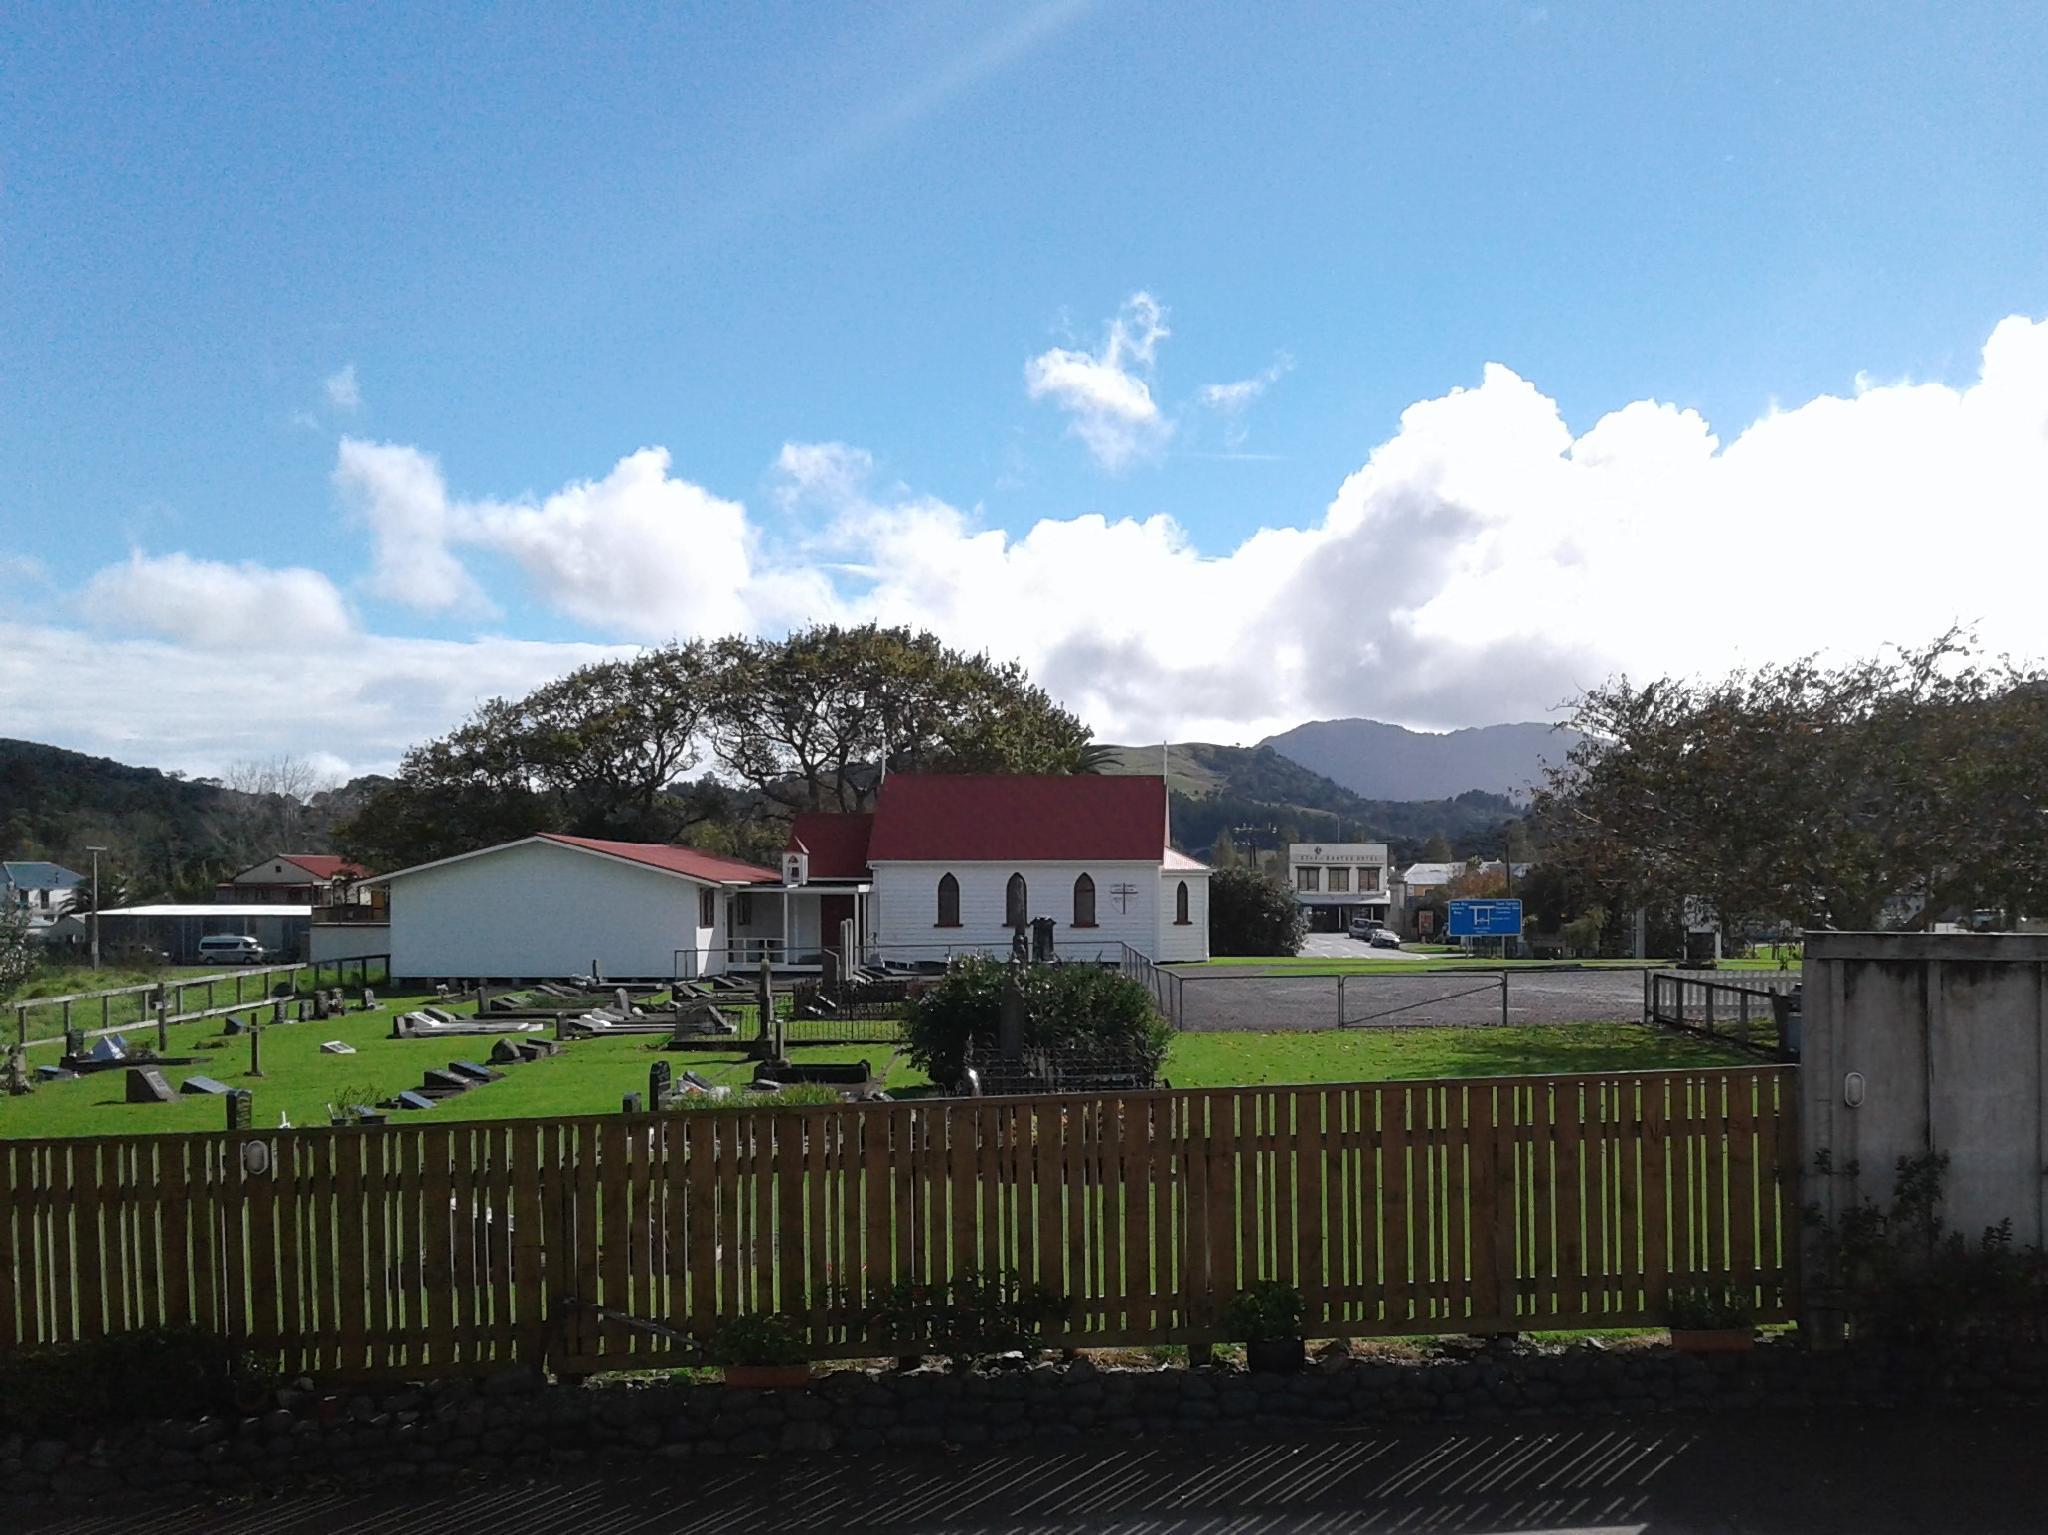 Abbey Court Motel And Little Farm